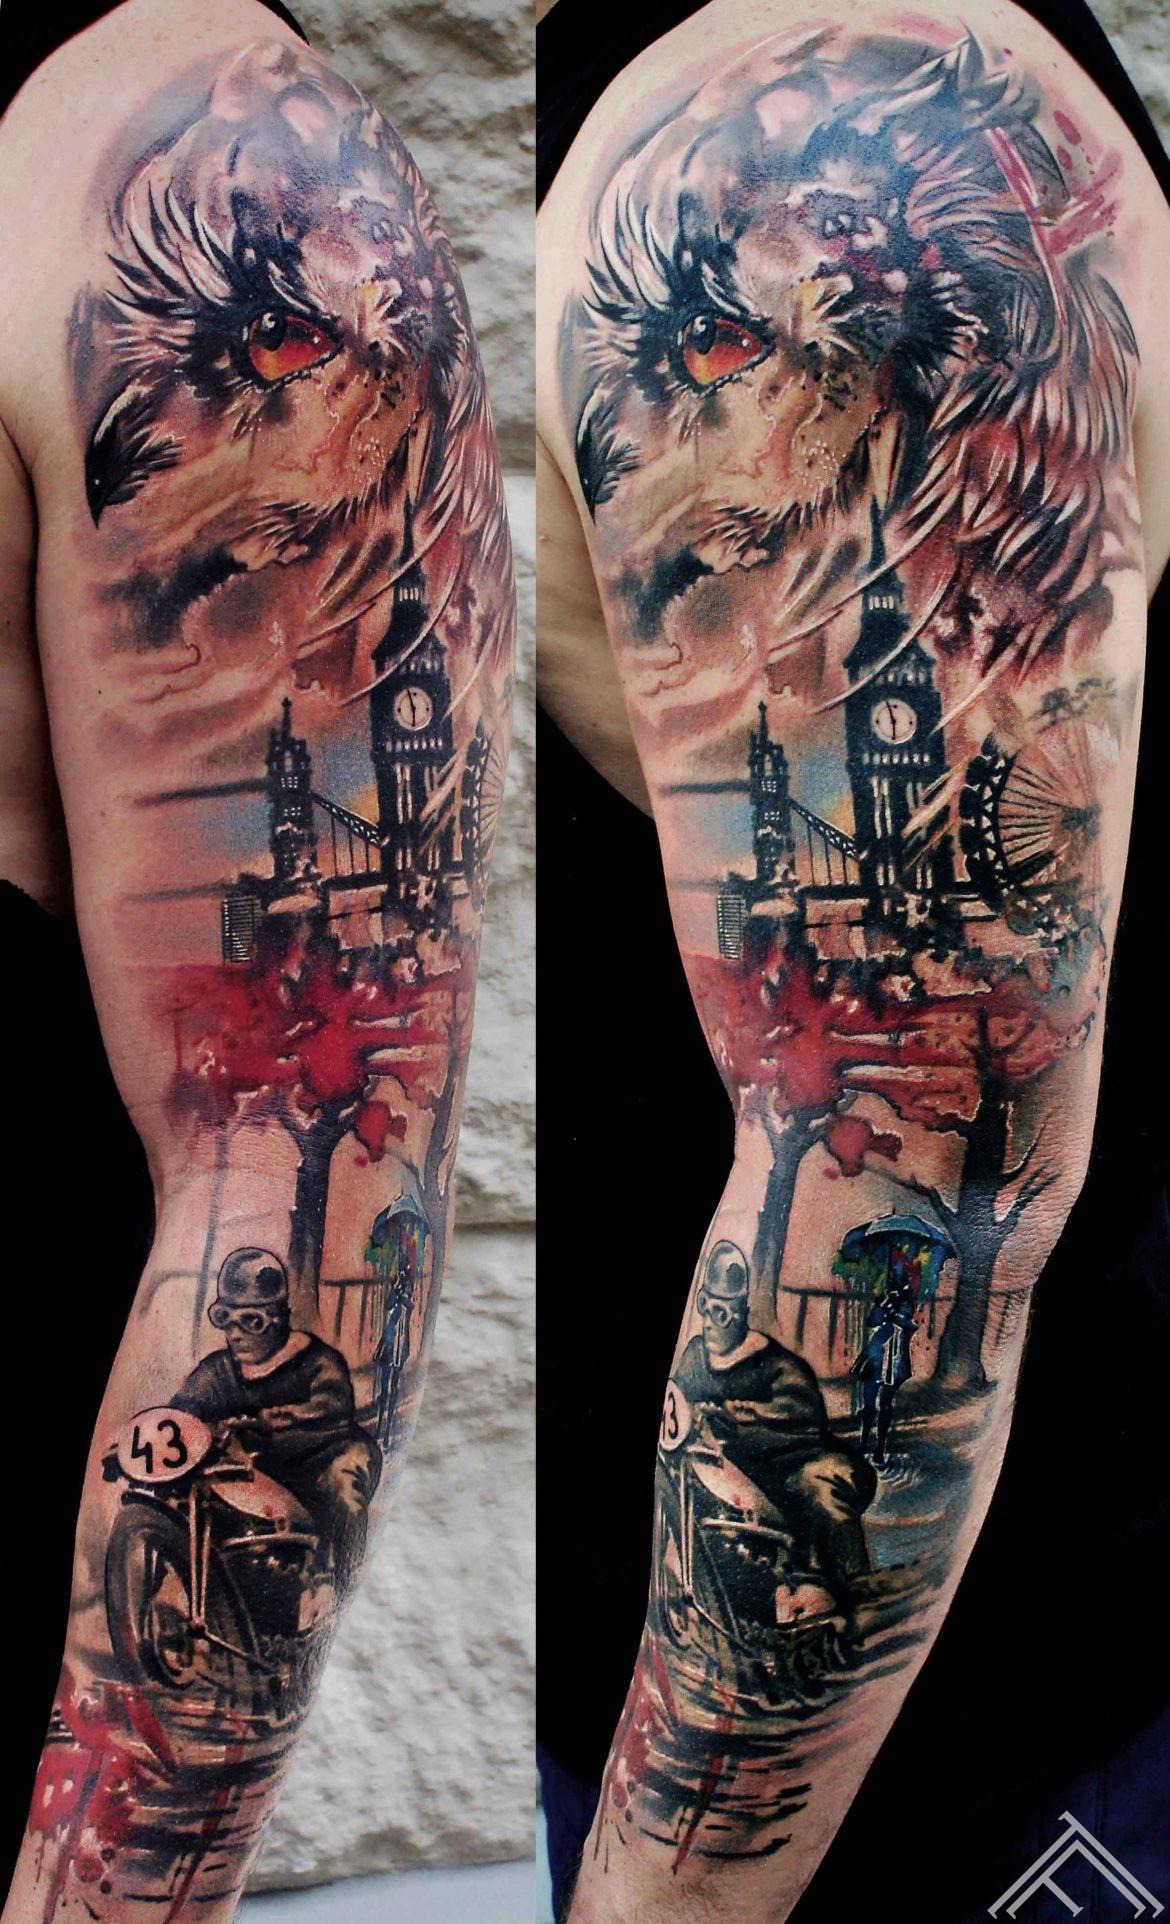 watercolour-sleeve-trashpolka-owl-bike-london-graphic-splash-tattoo-tattoofrequency-riga